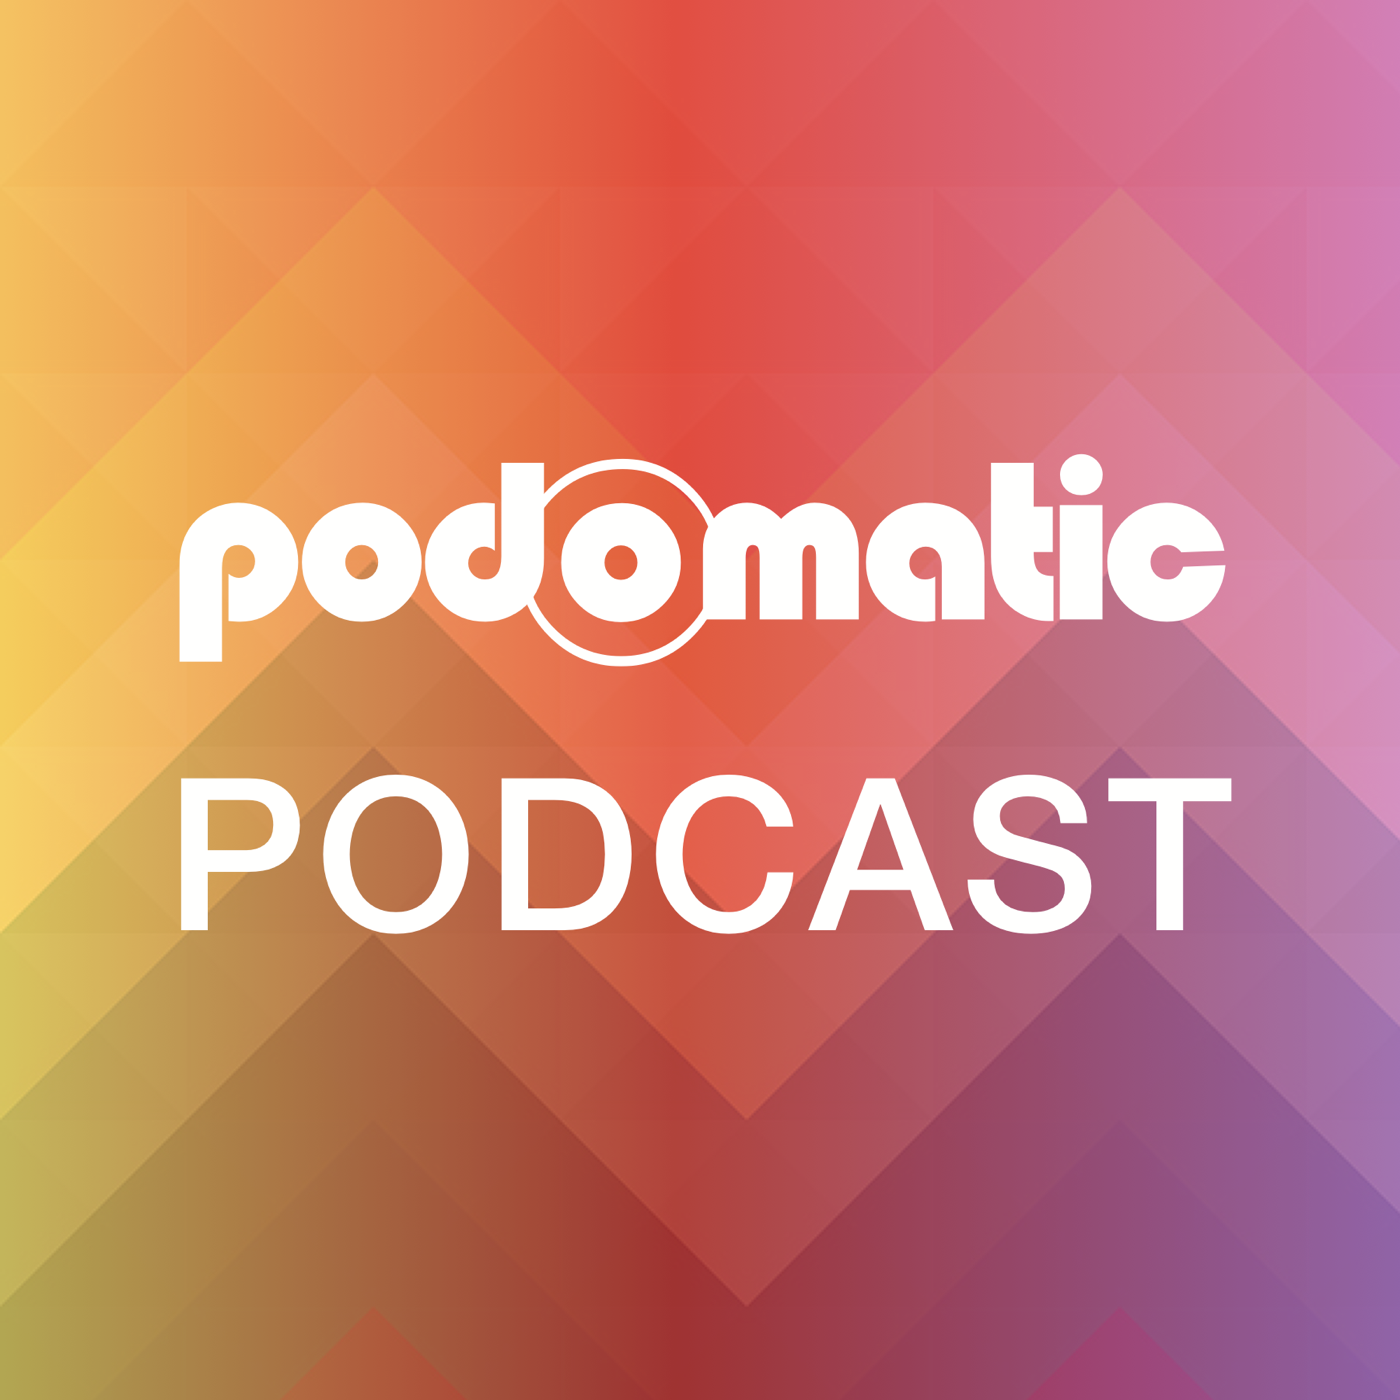 cory doviak's Podcast